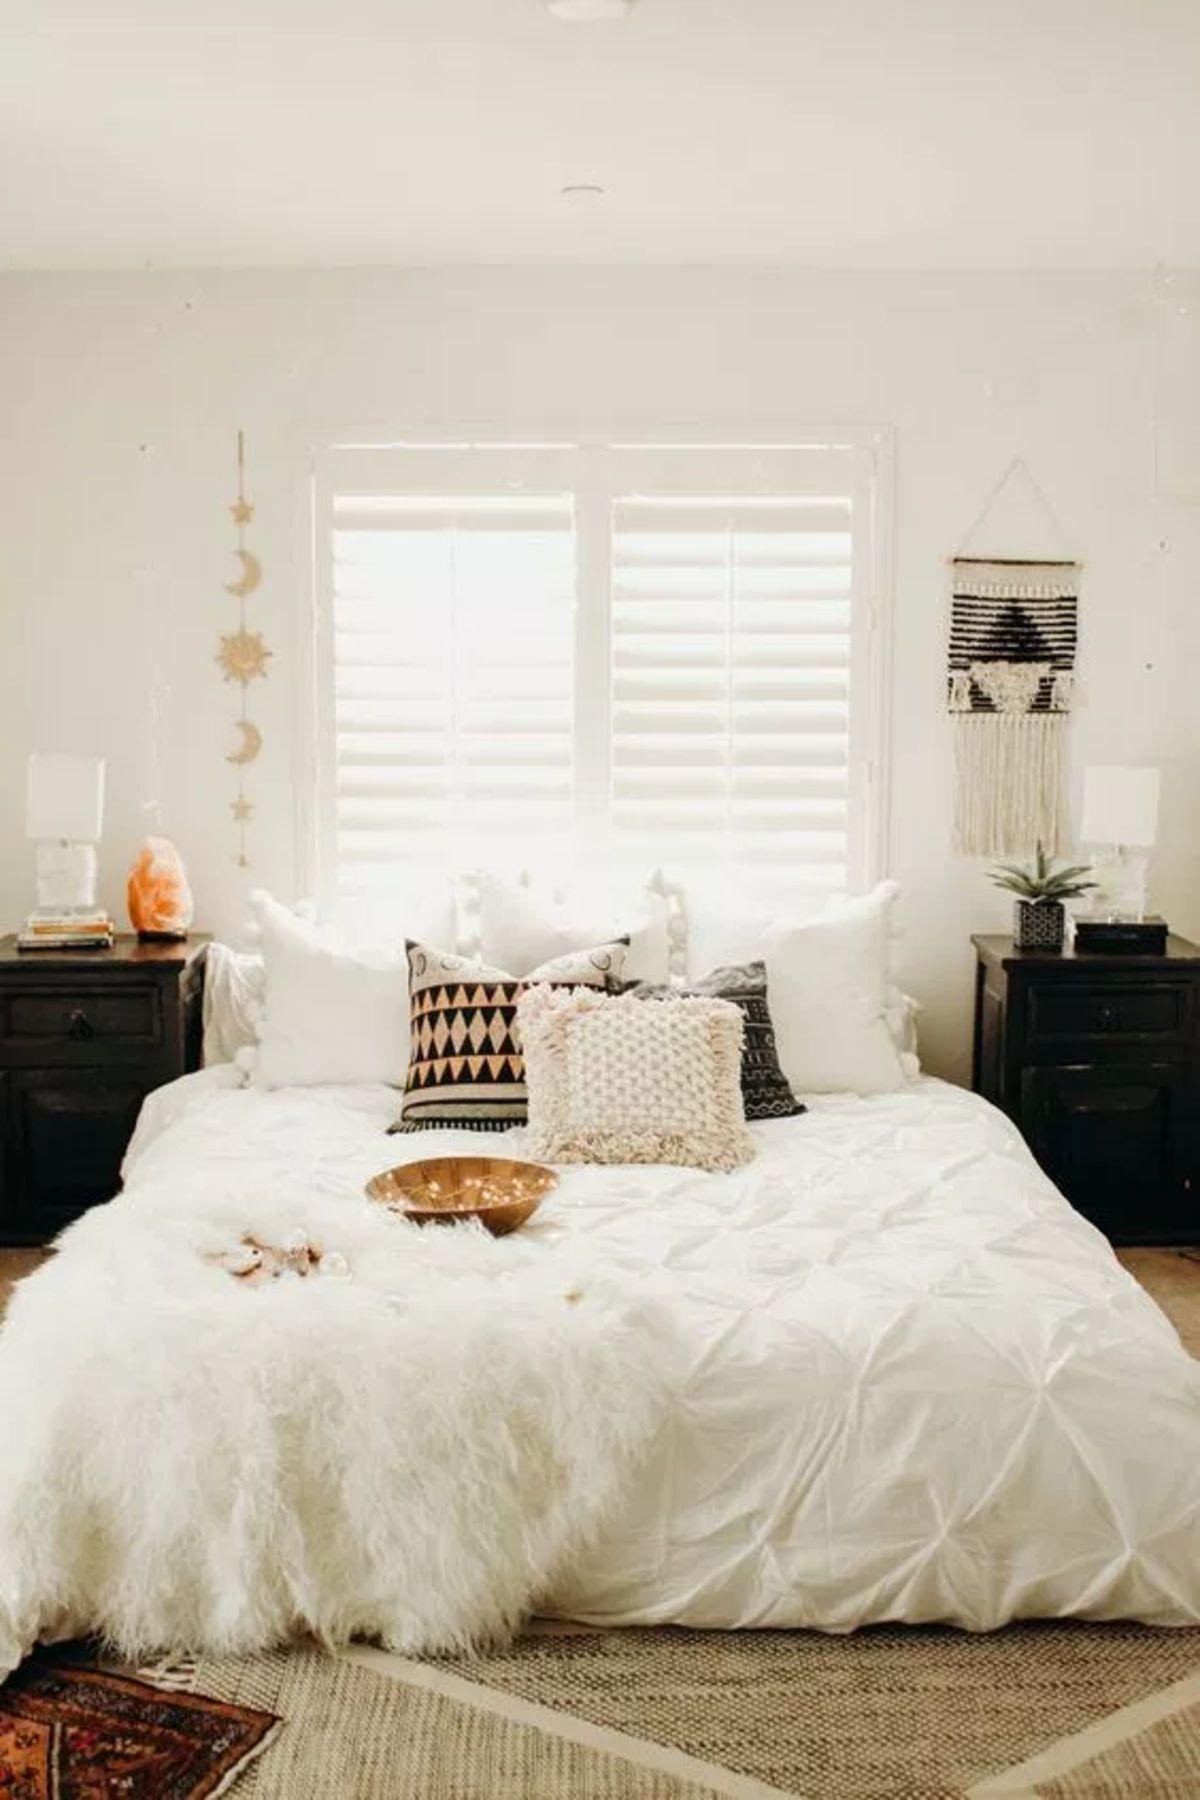 30 Boho Chic Bedroom Decor Ideas And Inspiration Simple Cozy